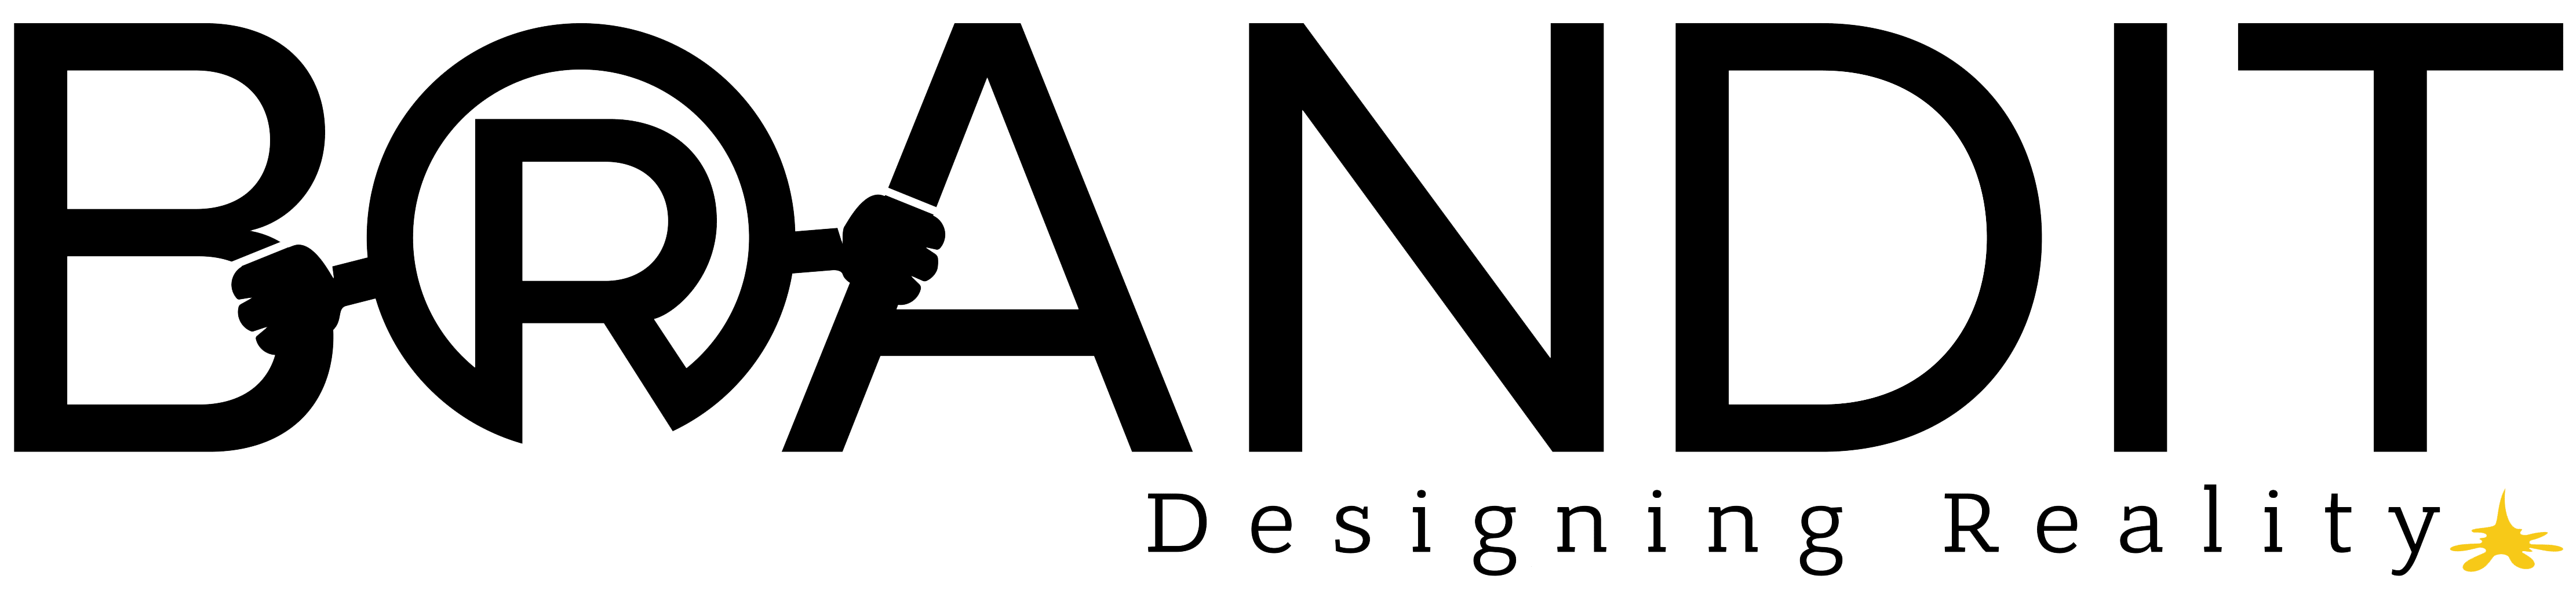 brandit logo crni